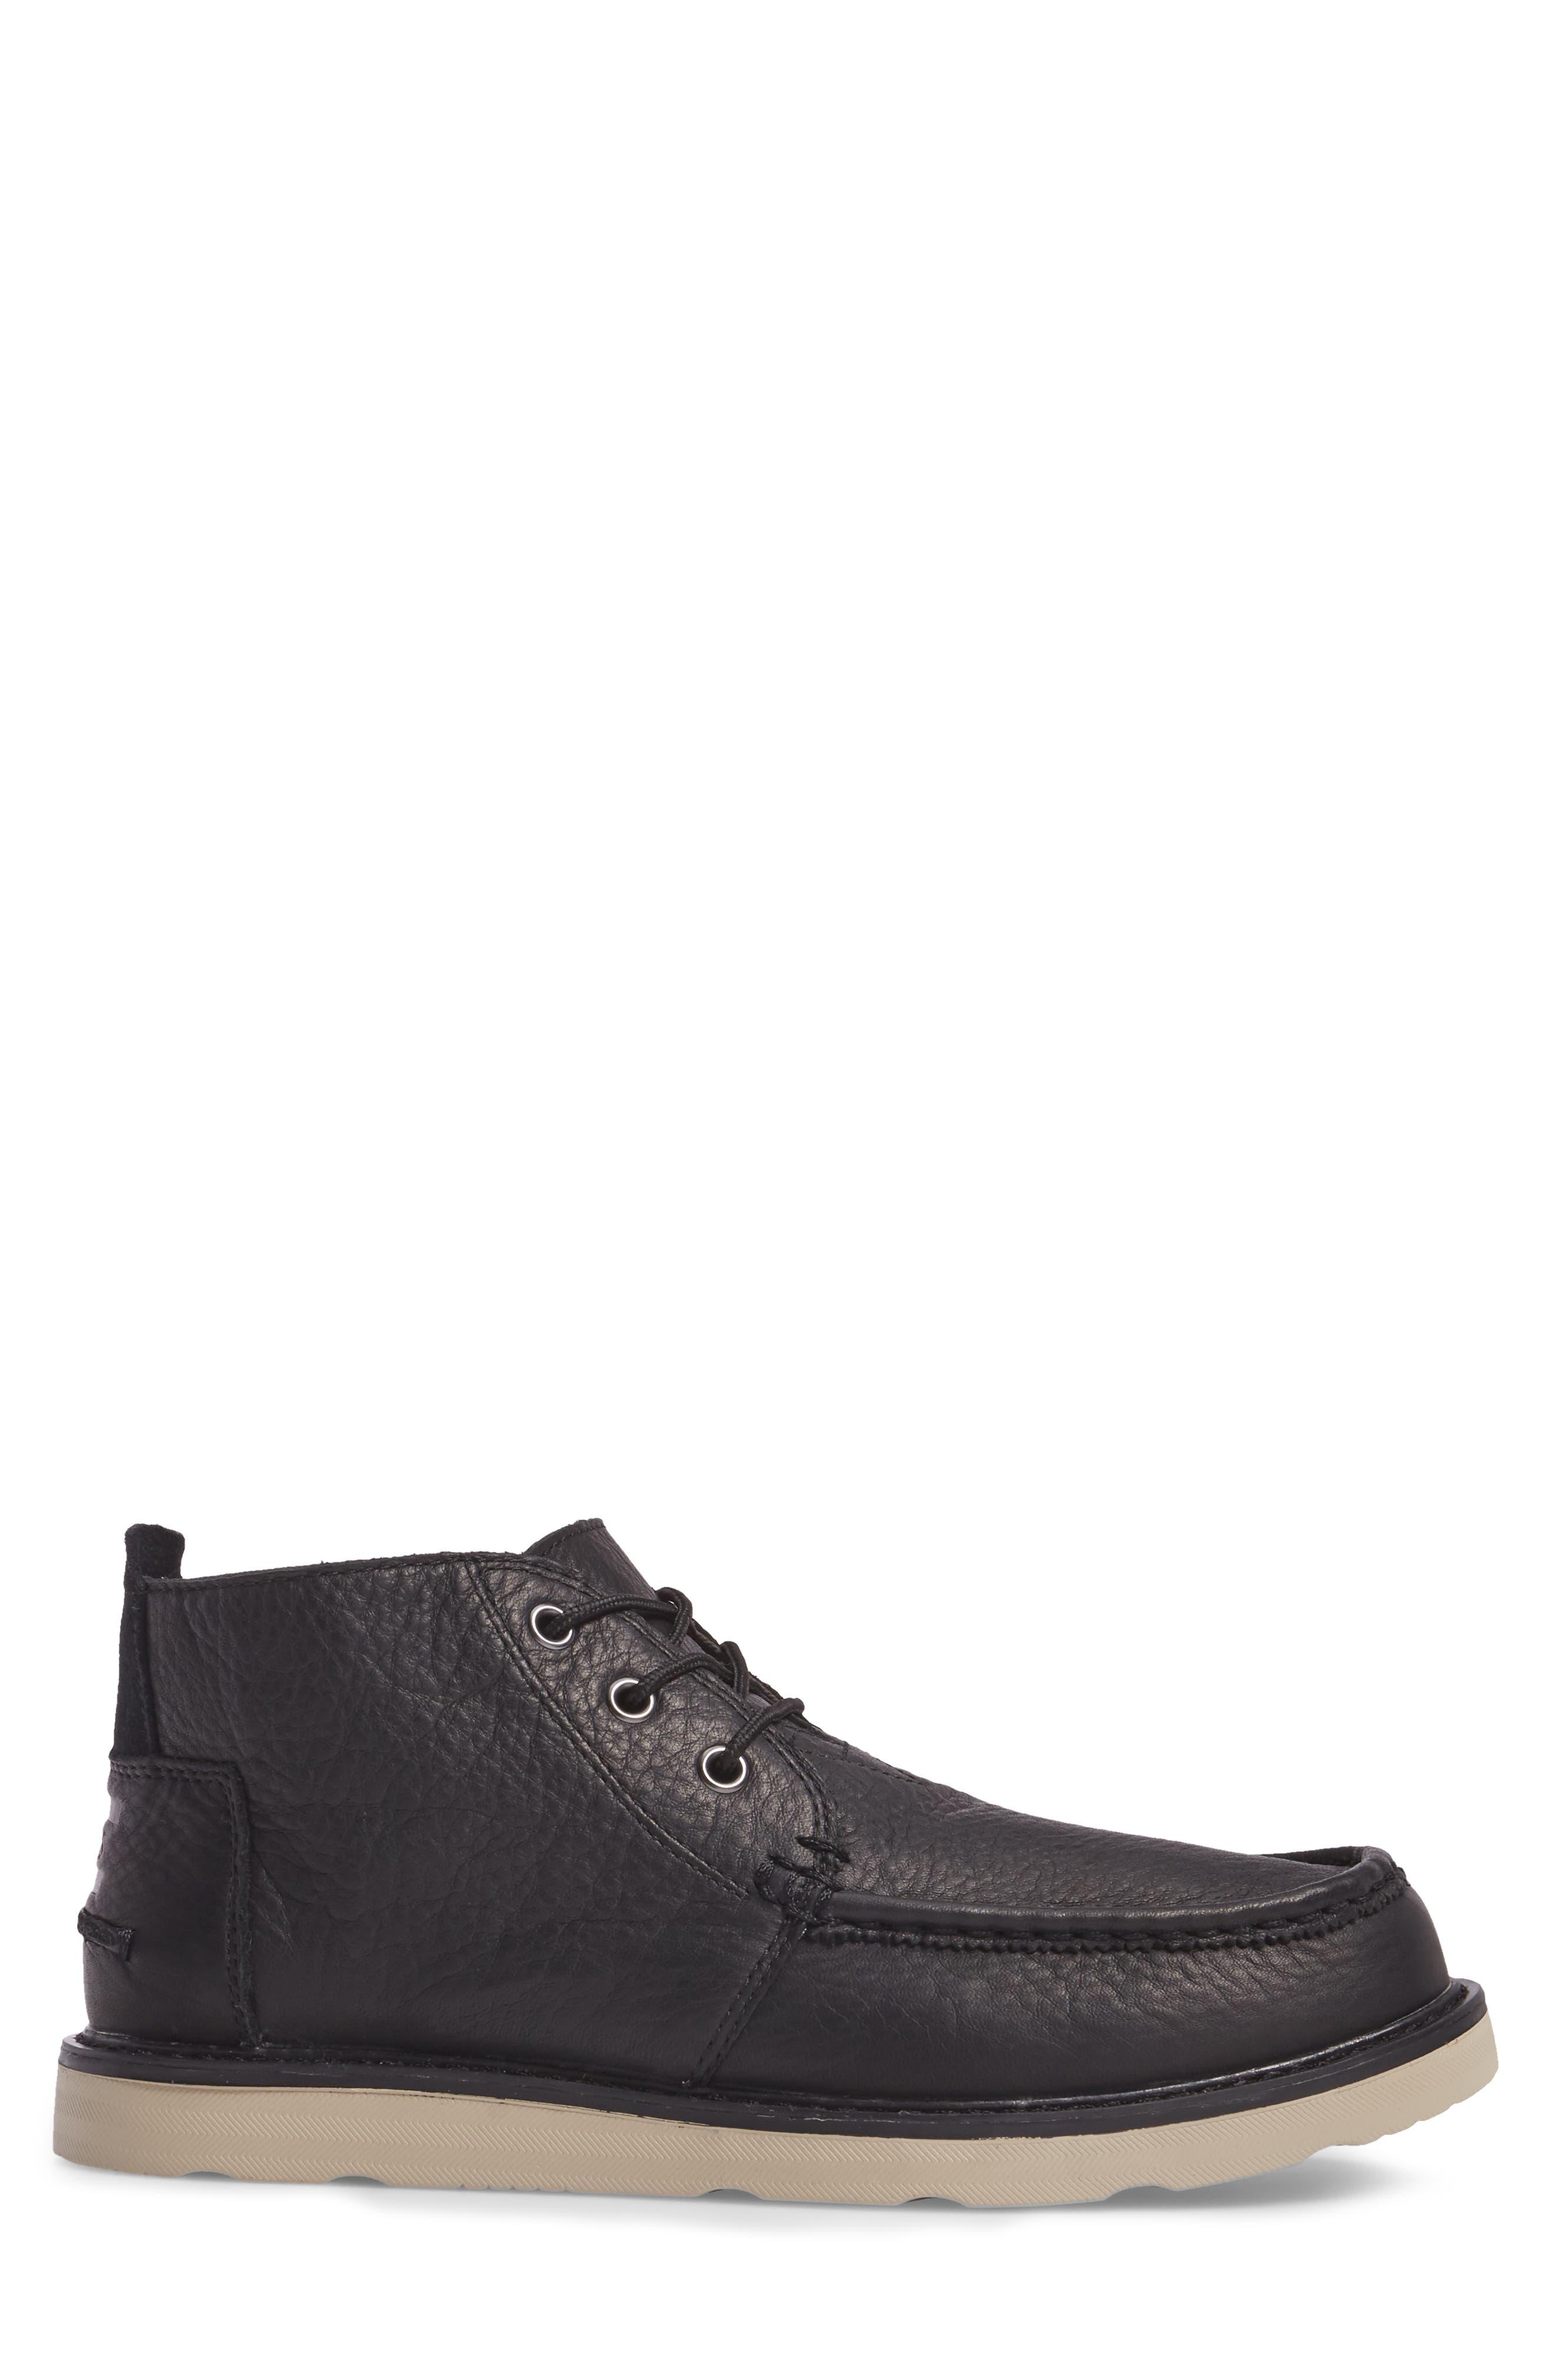 Chukka Boot,                             Alternate thumbnail 3, color,                             Black/Black Leather